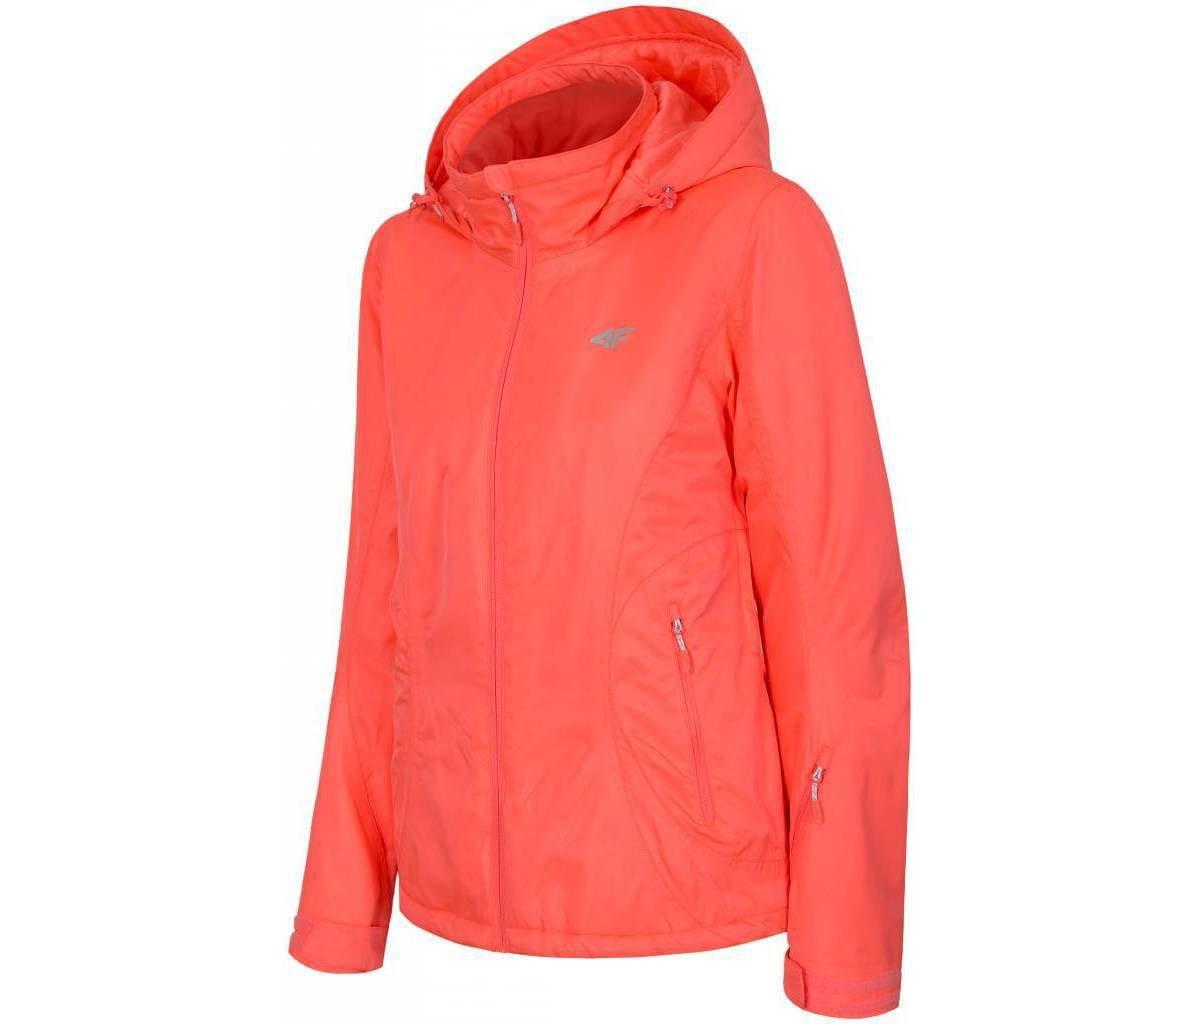 Bundy 4F Ski jacket KUDN003